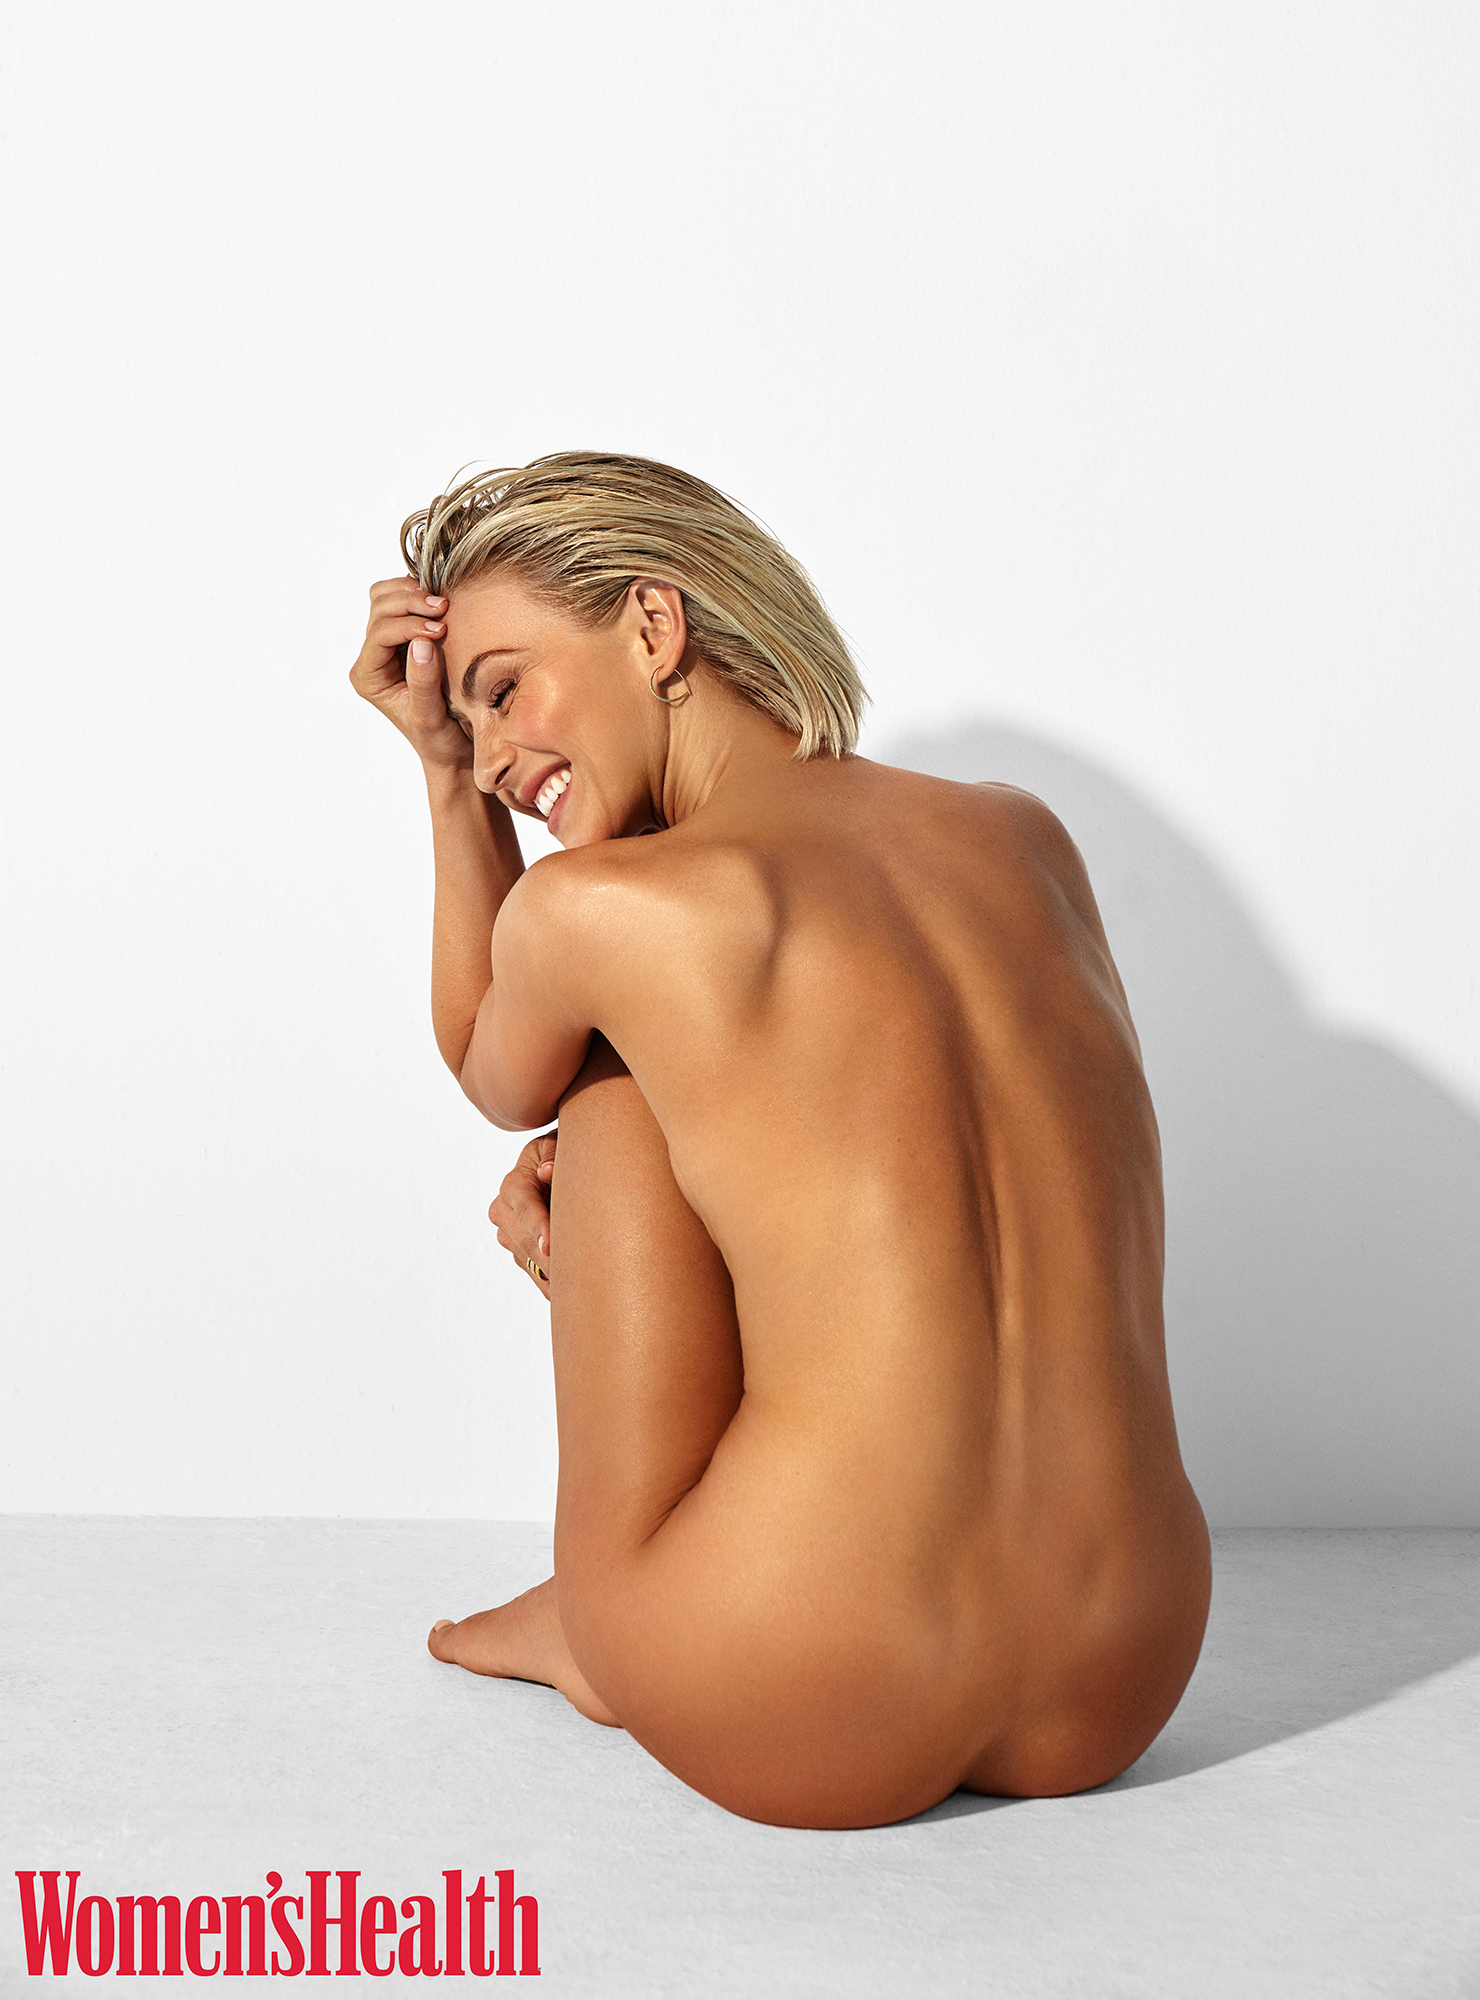 Nud pik